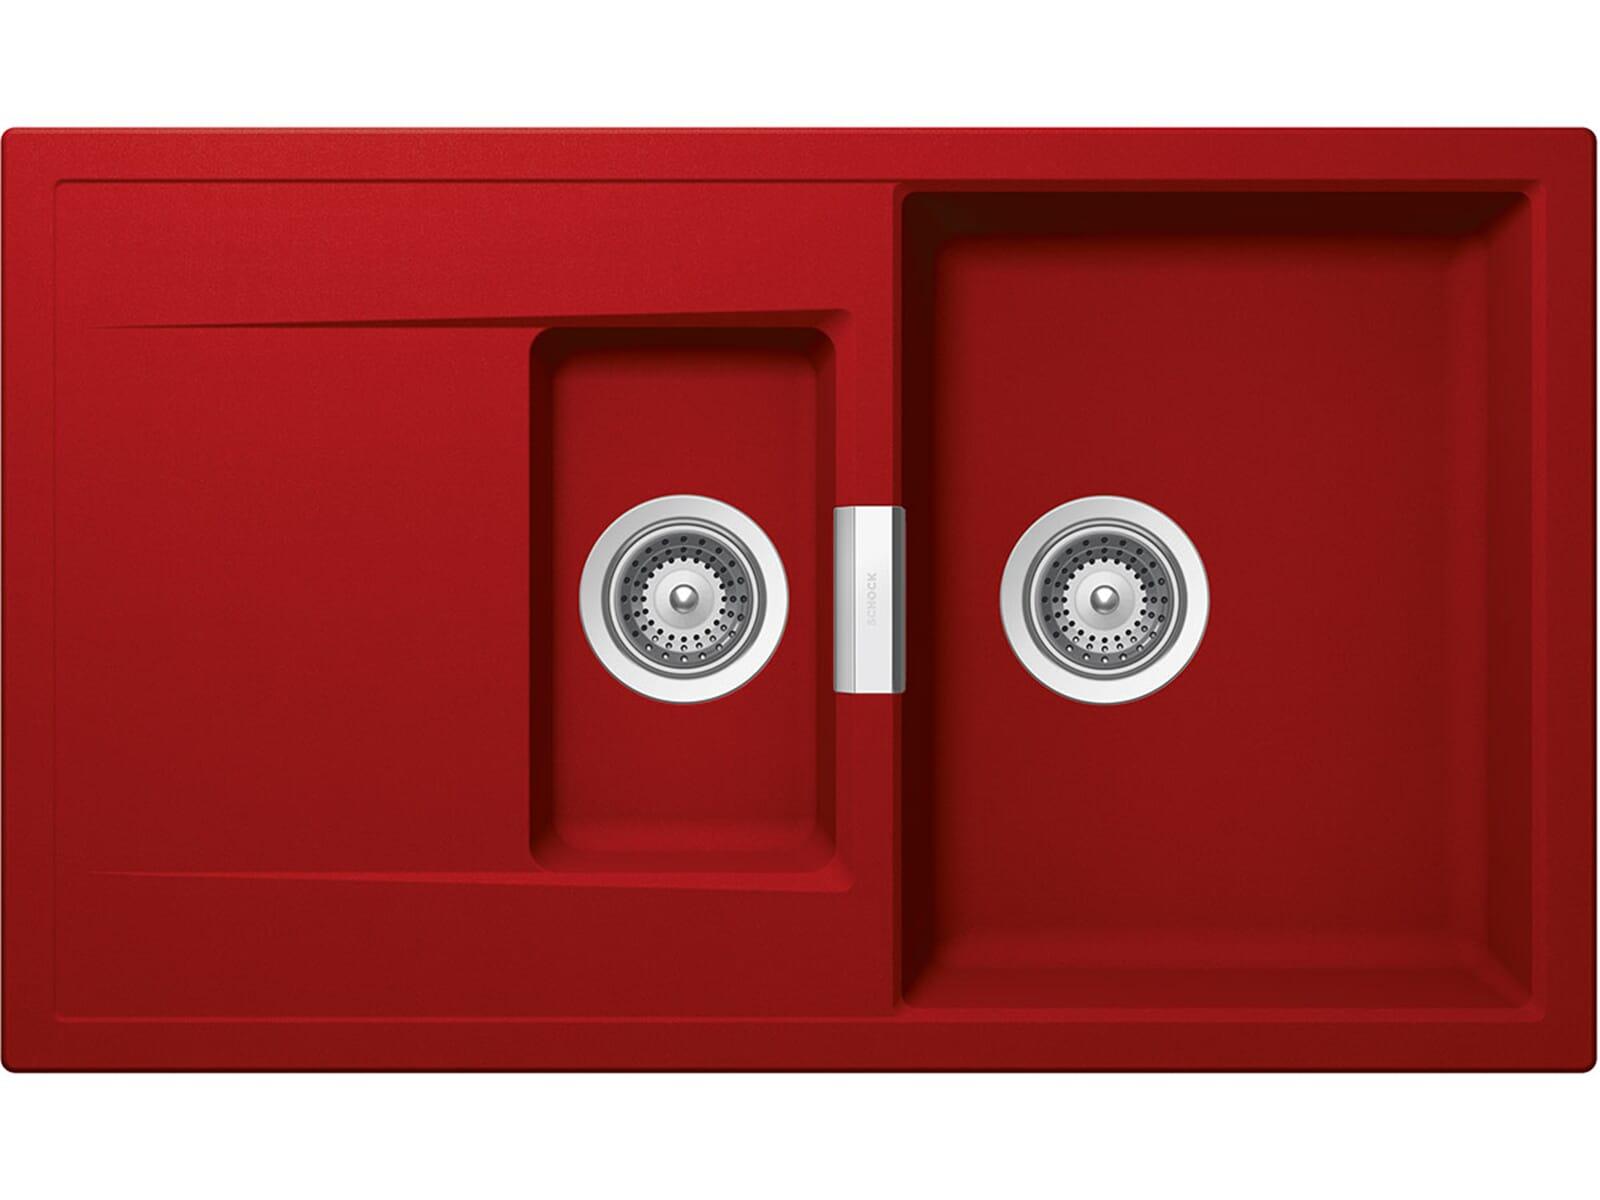 Schock Mono D-150 A Rouge - MOND150AROU Granitspüle